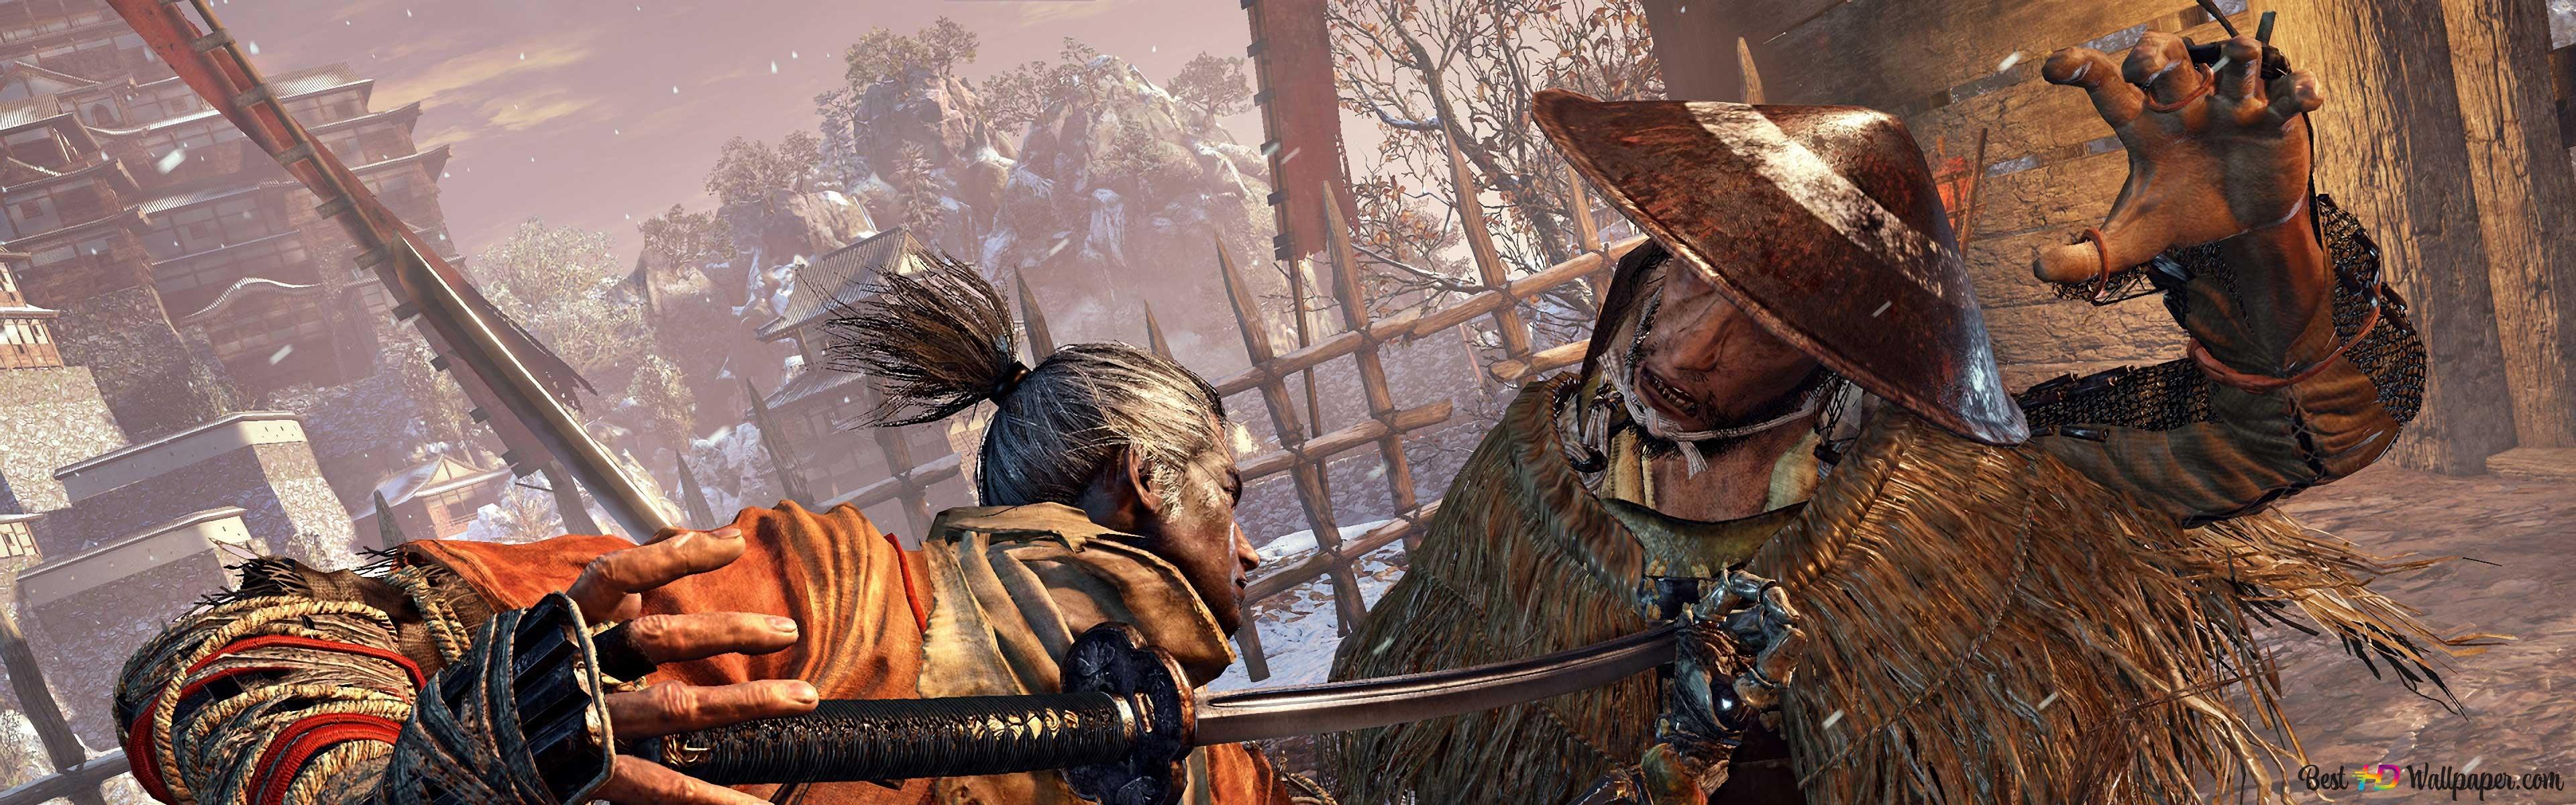 Sekiro Shadows Die Twice Samurai Hd Wallpaper Download